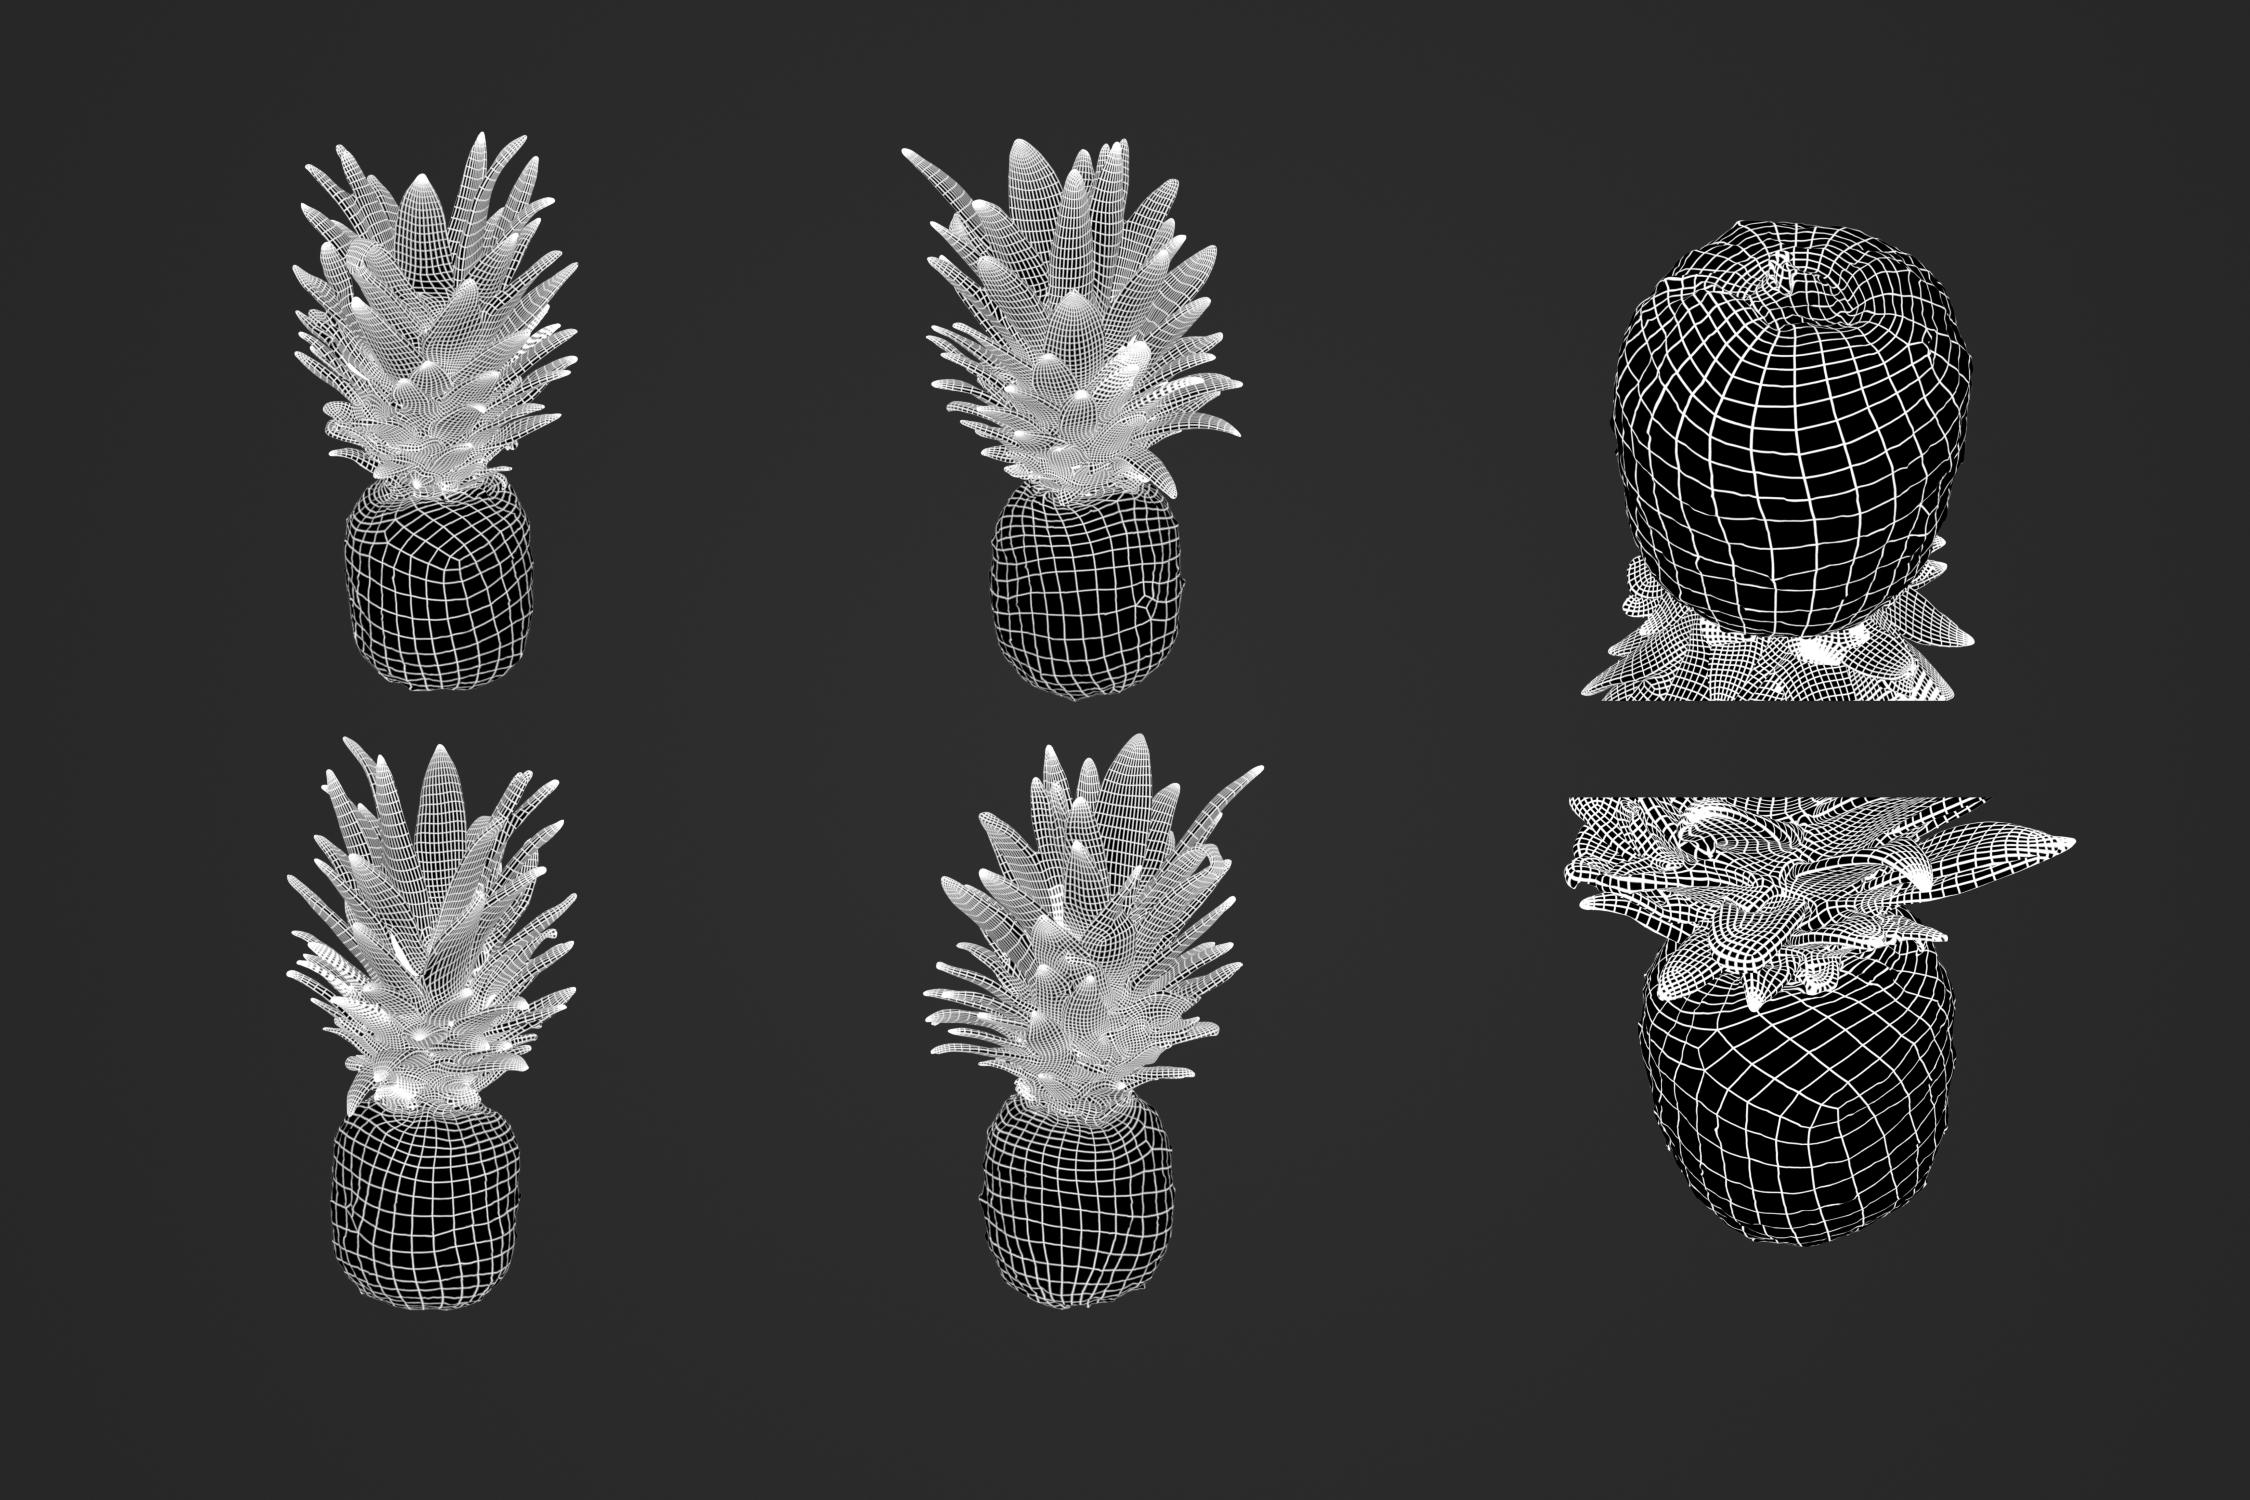 Pineapple_1_2.jpg